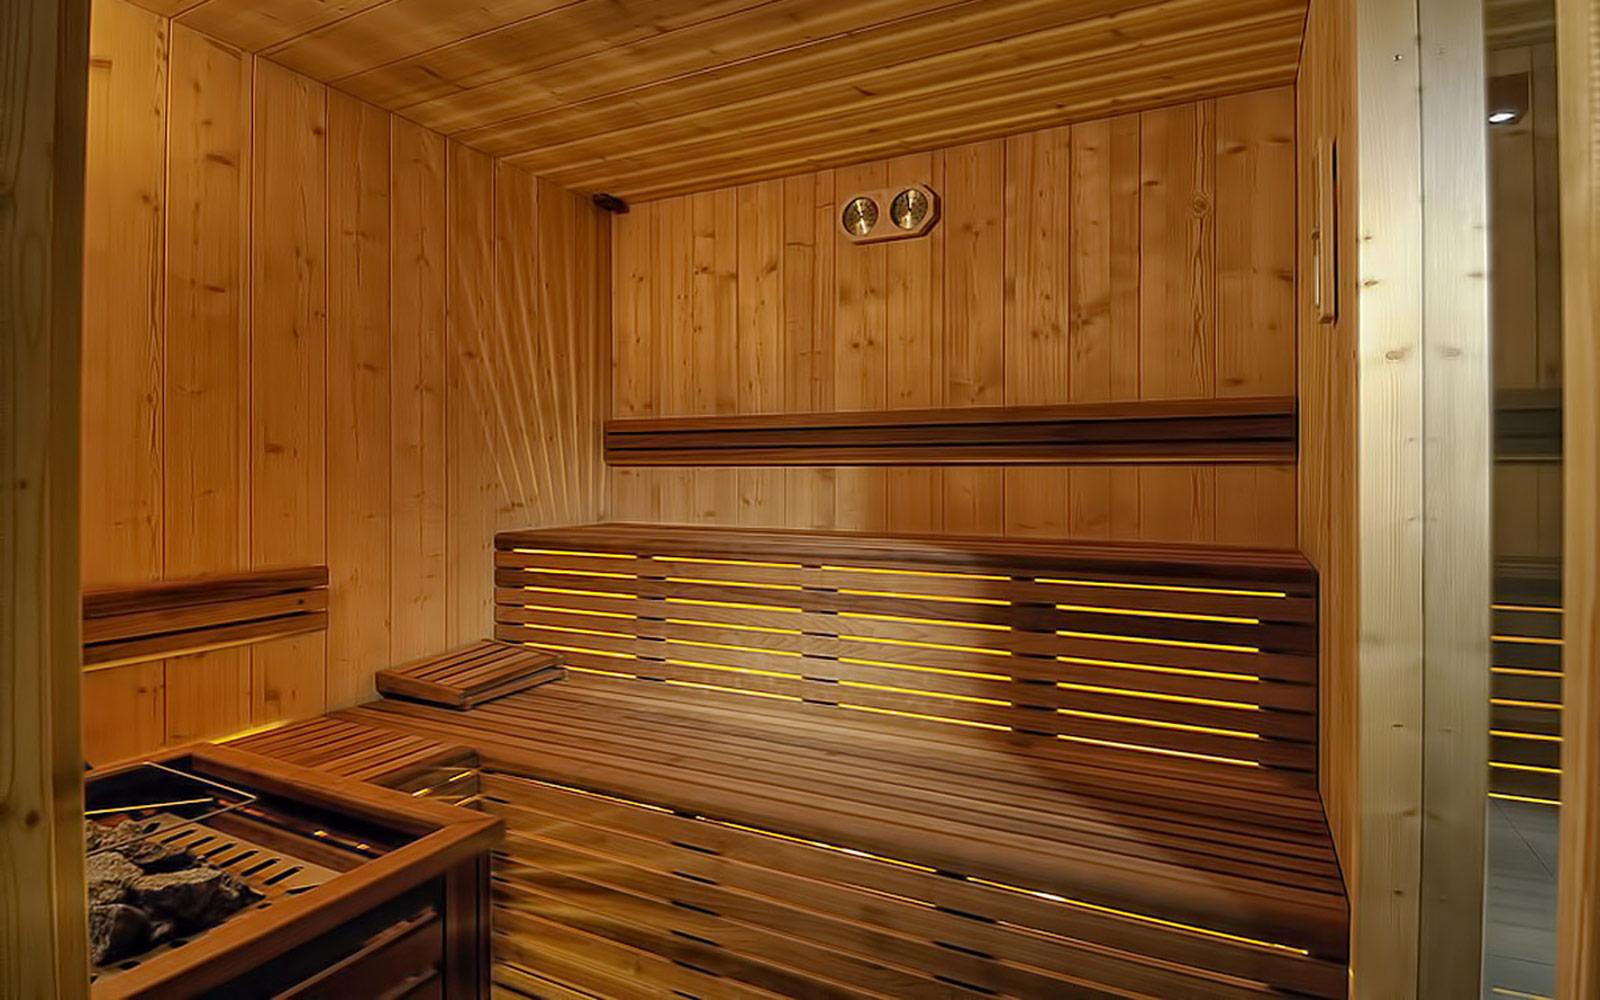 SAUNA FINLANDESE<br>HOTEL SPORTING - MEZZANA